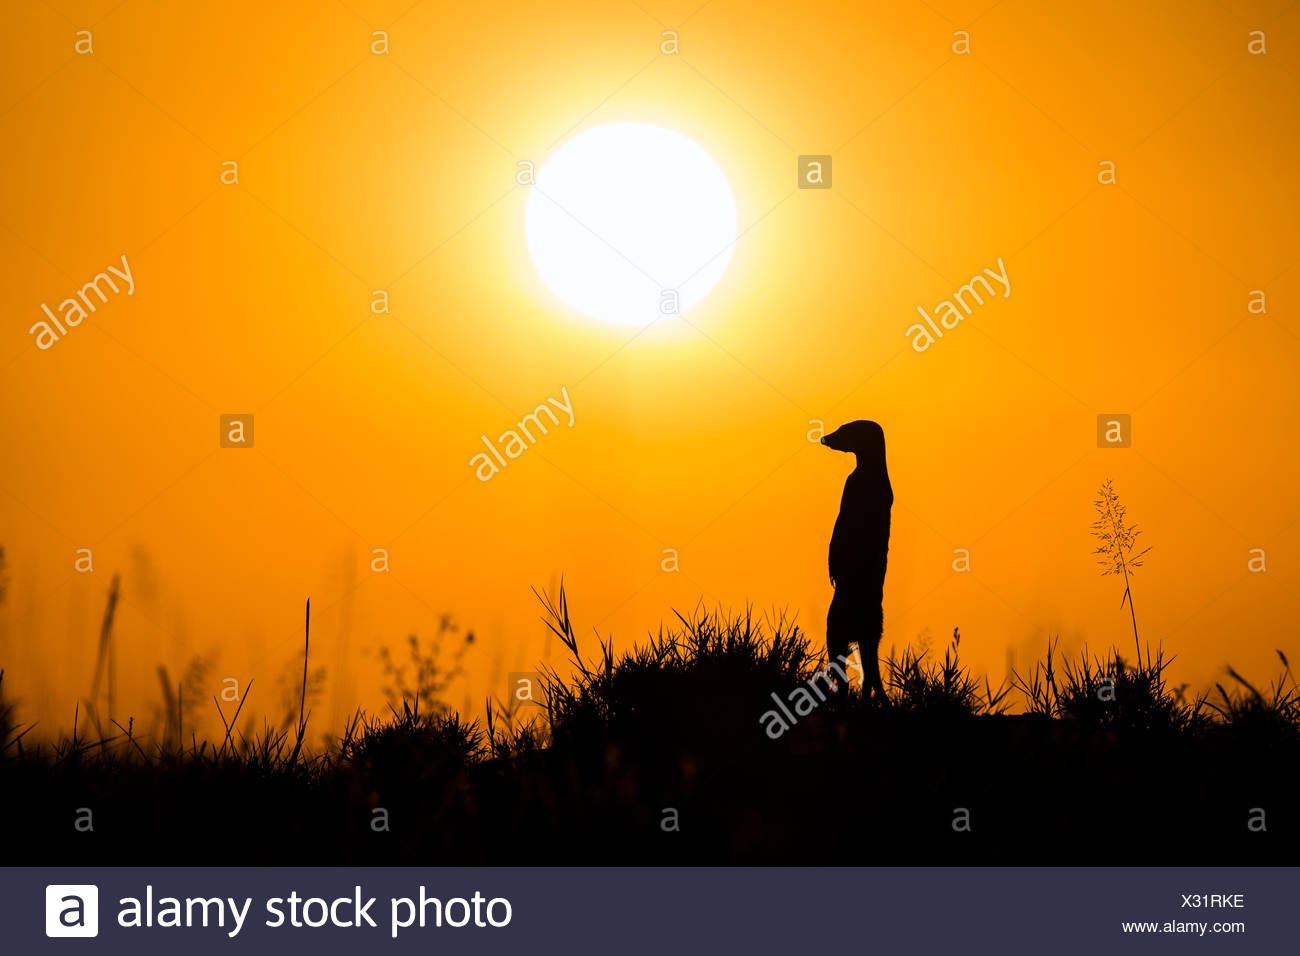 Suricata o (Suricata suricatta) alerta permanente sobre las patas traseras al atardecer, Makgadikgadi Pans en Botswana. Imagen De Stock